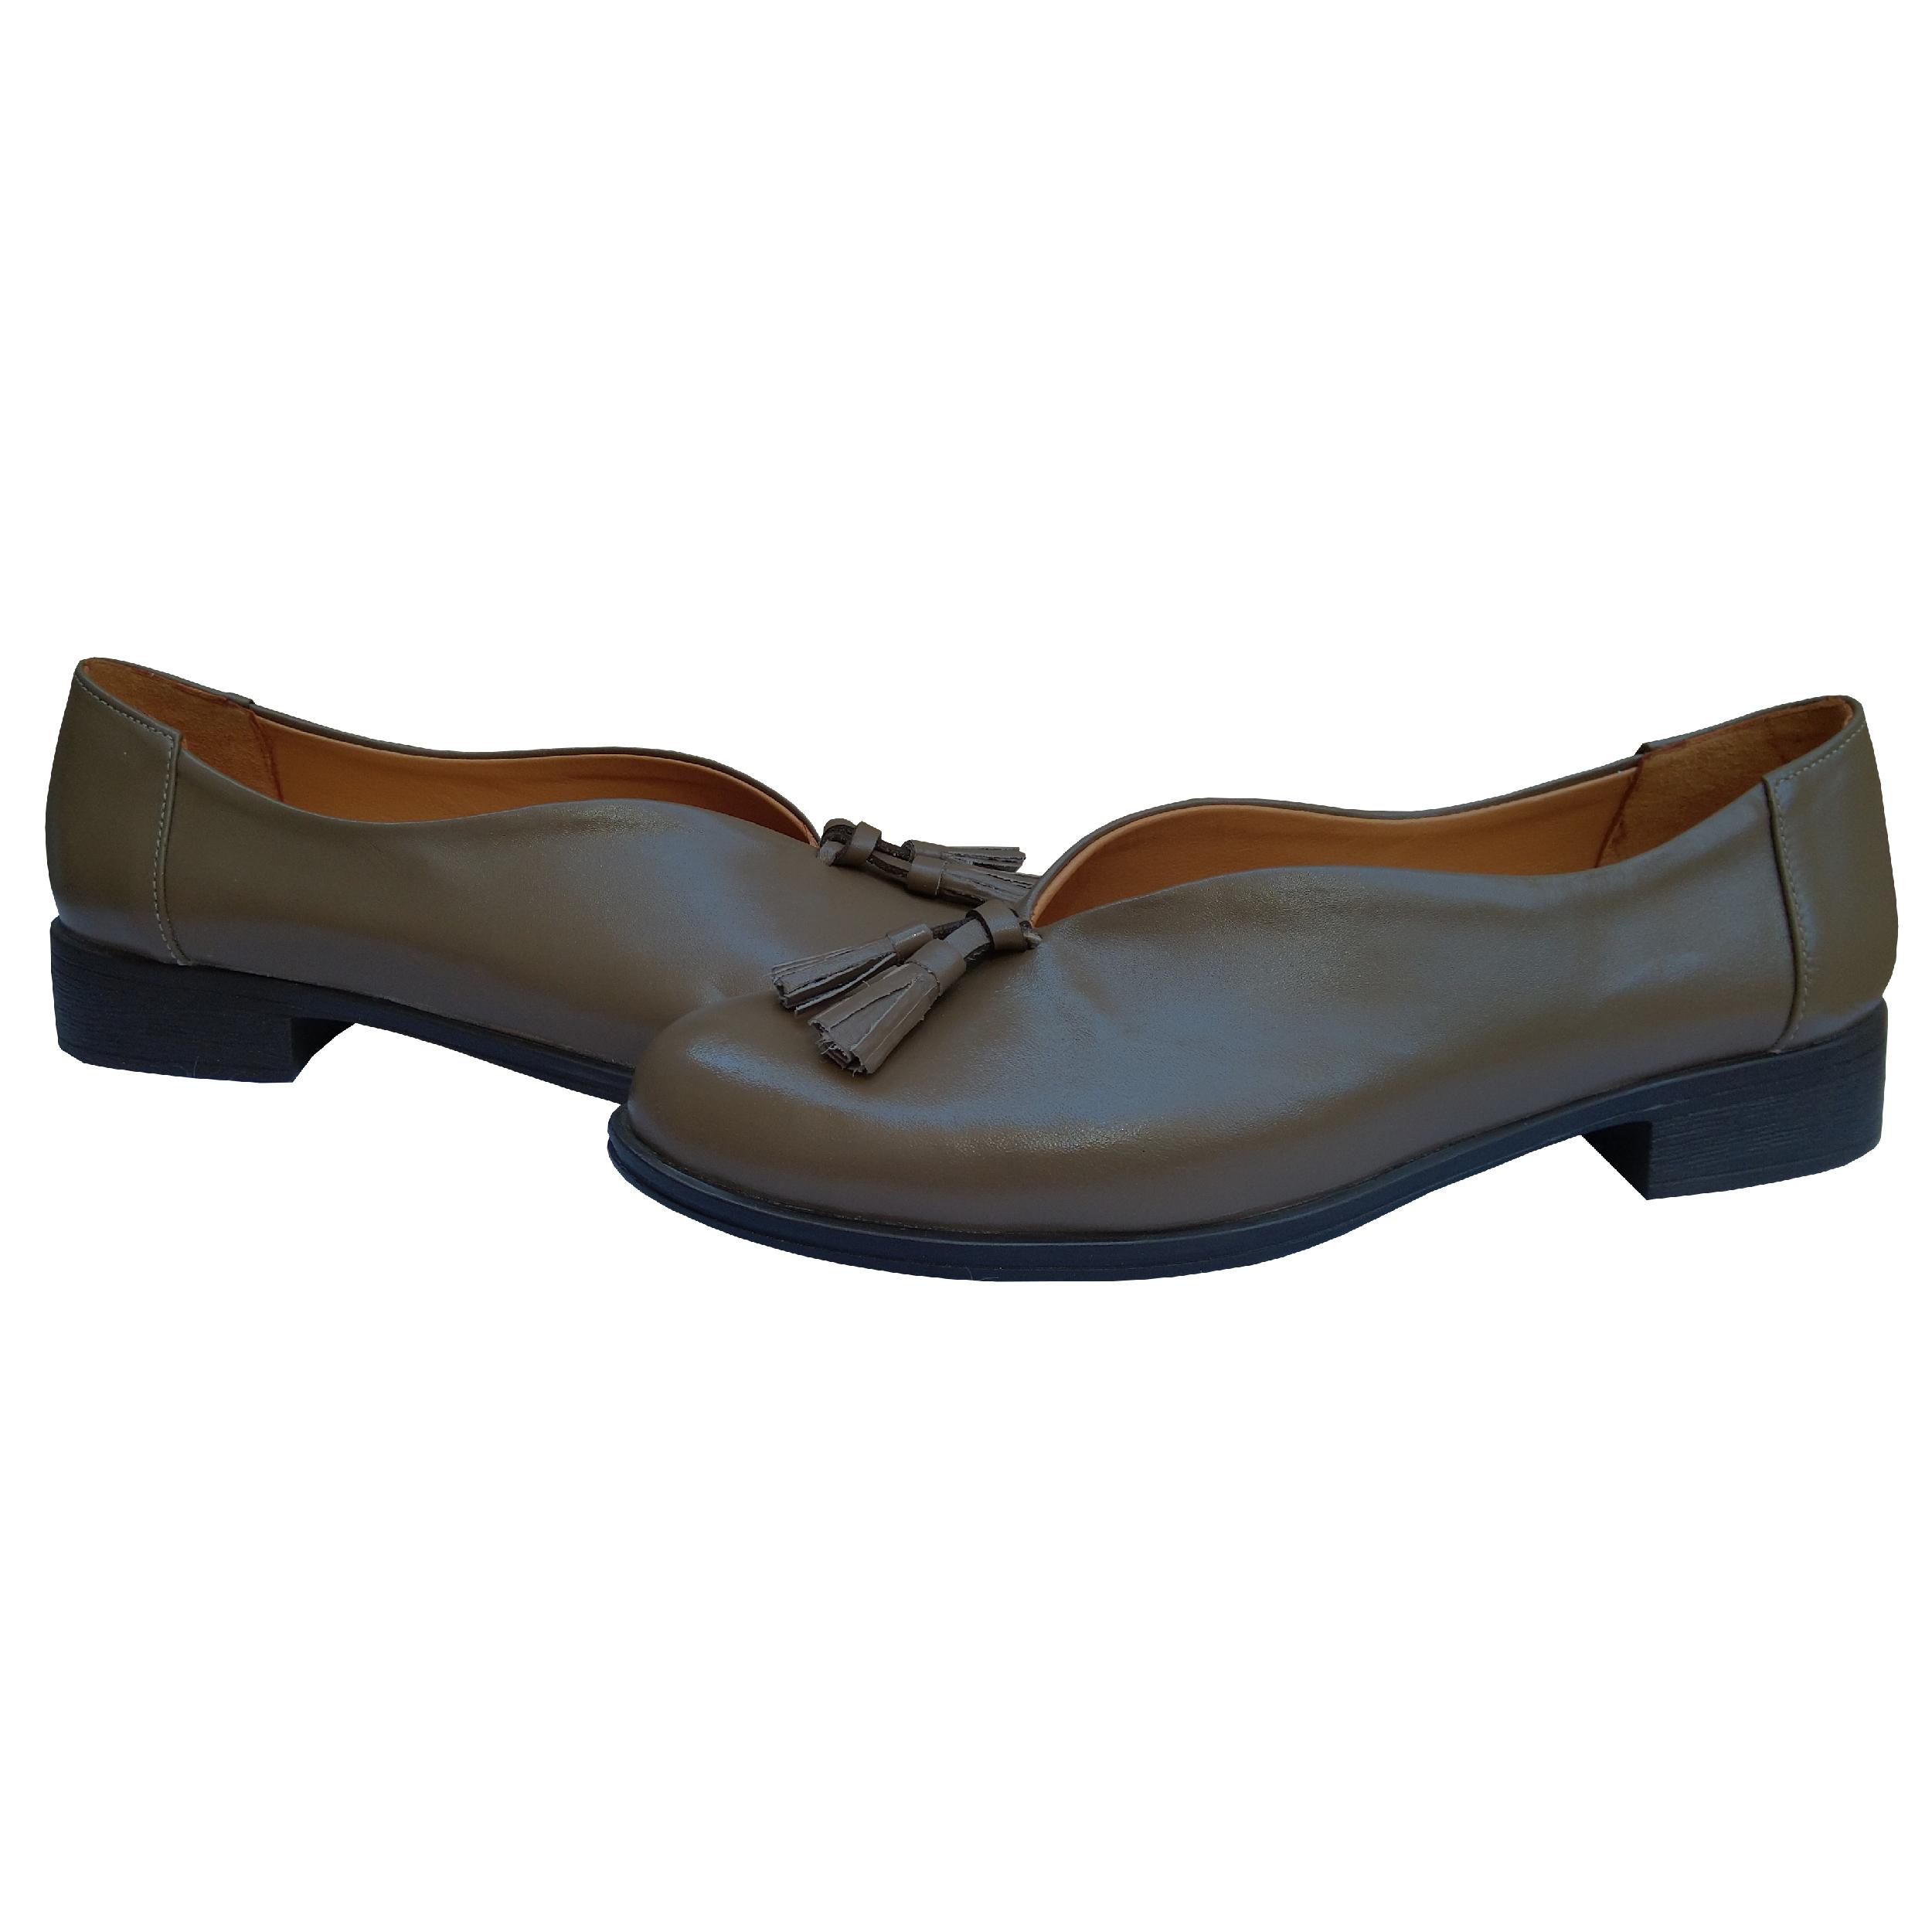 کفش زنانه مدل SK 309 -  - 3